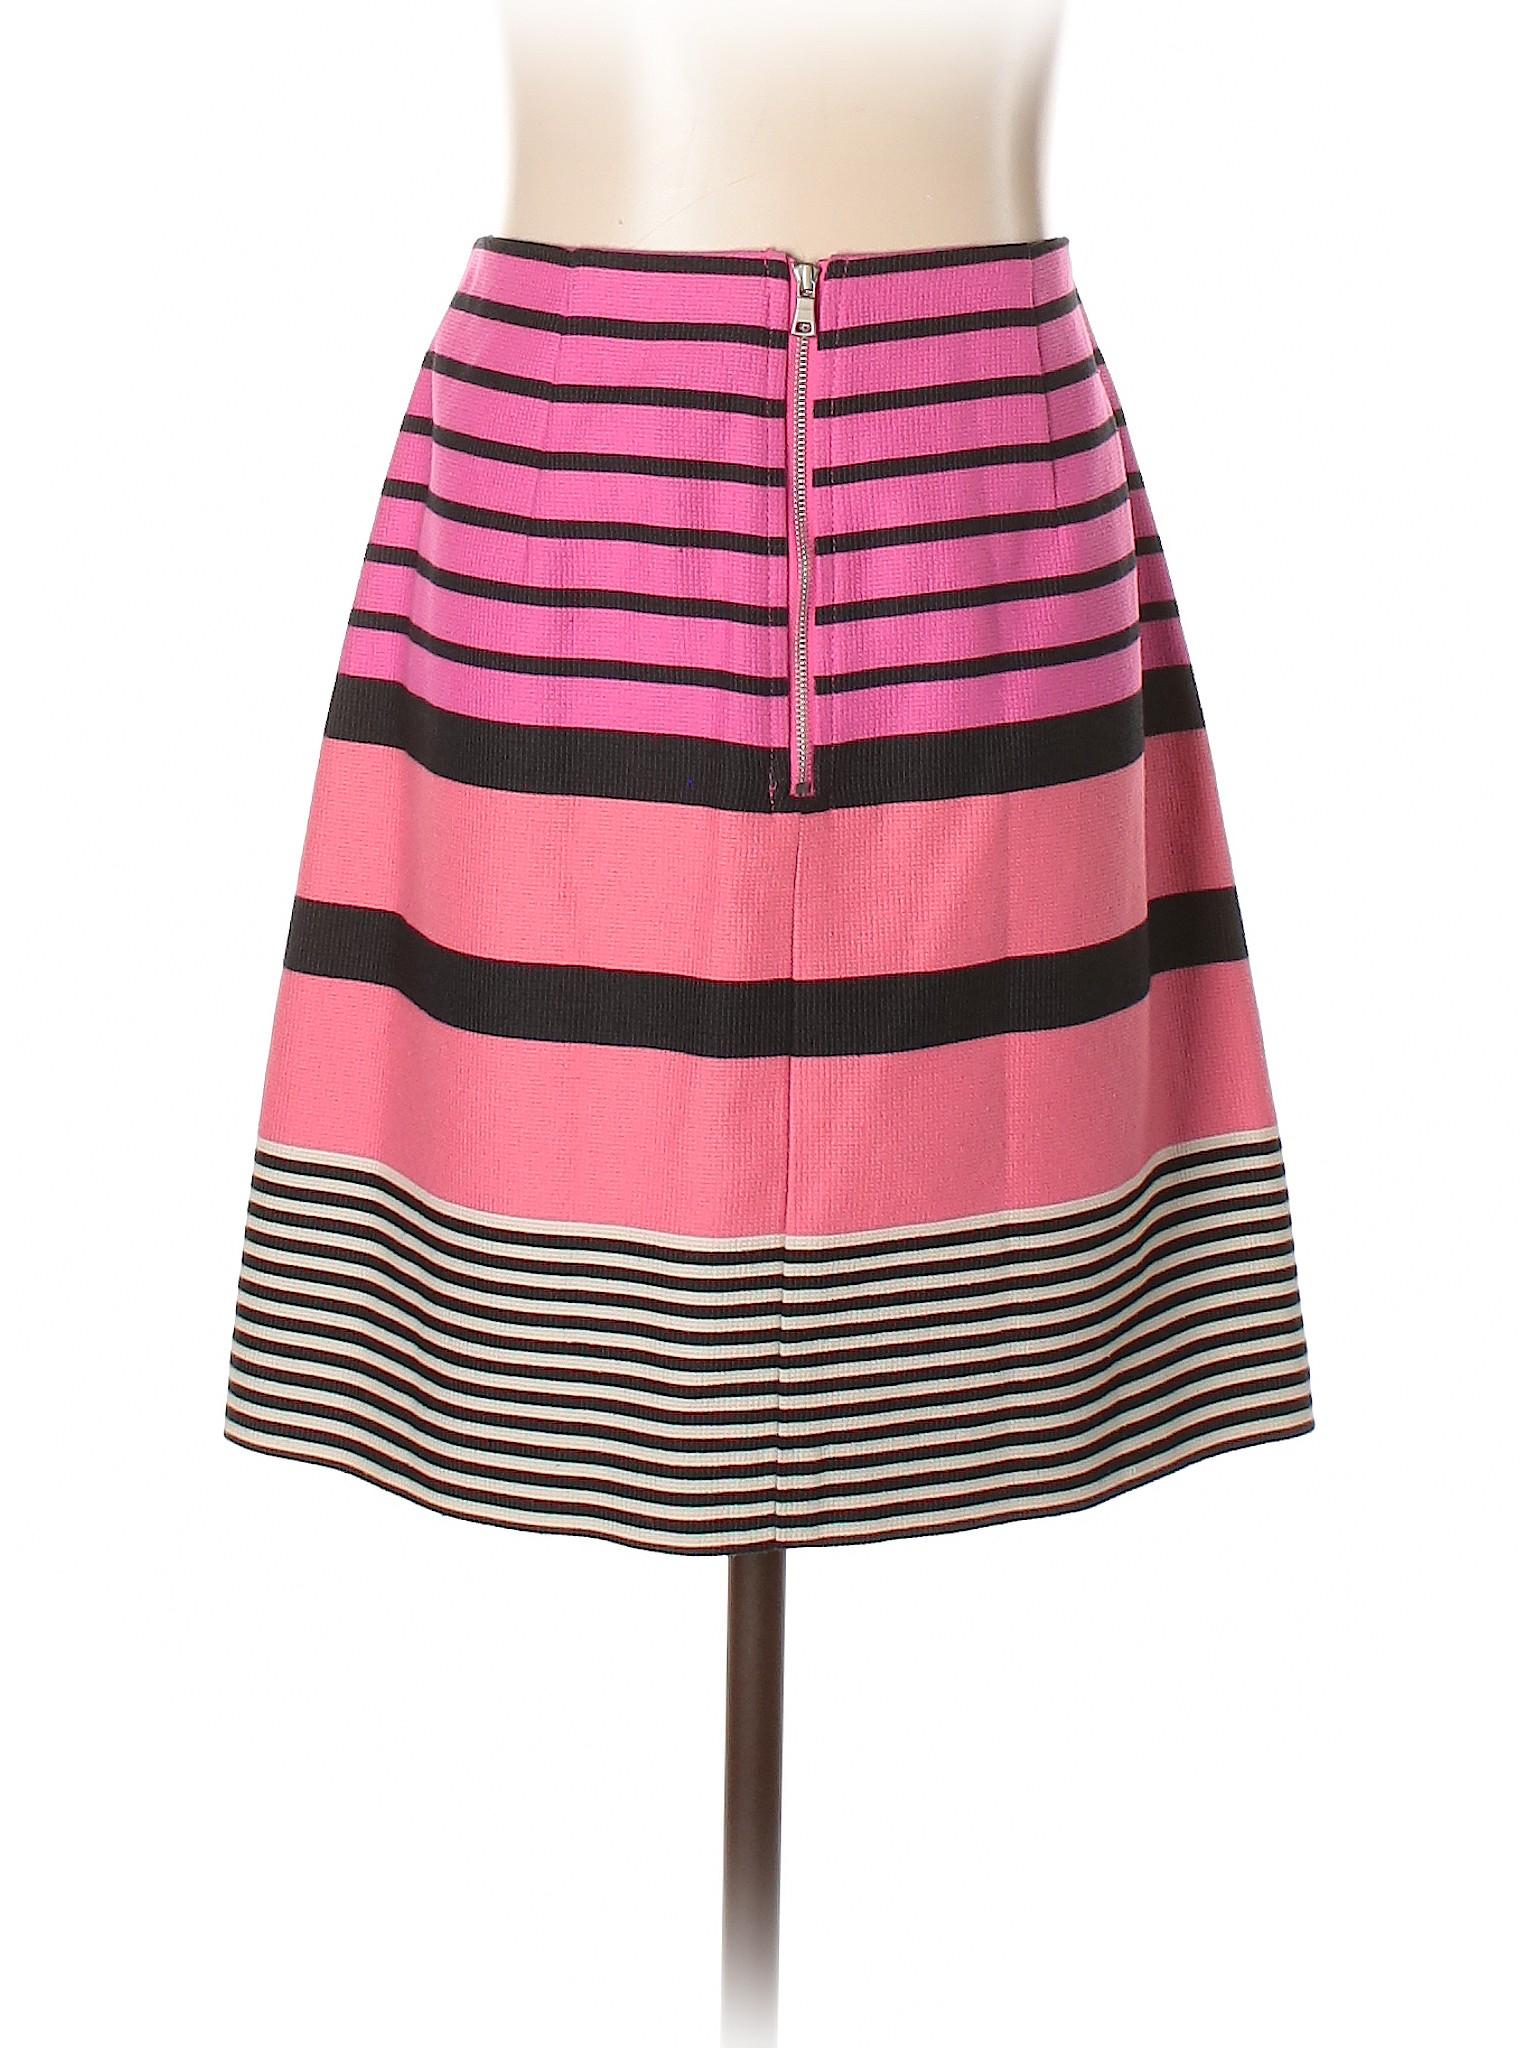 Boutique Skirt Casual Boutique Casual qwXOnSf5x